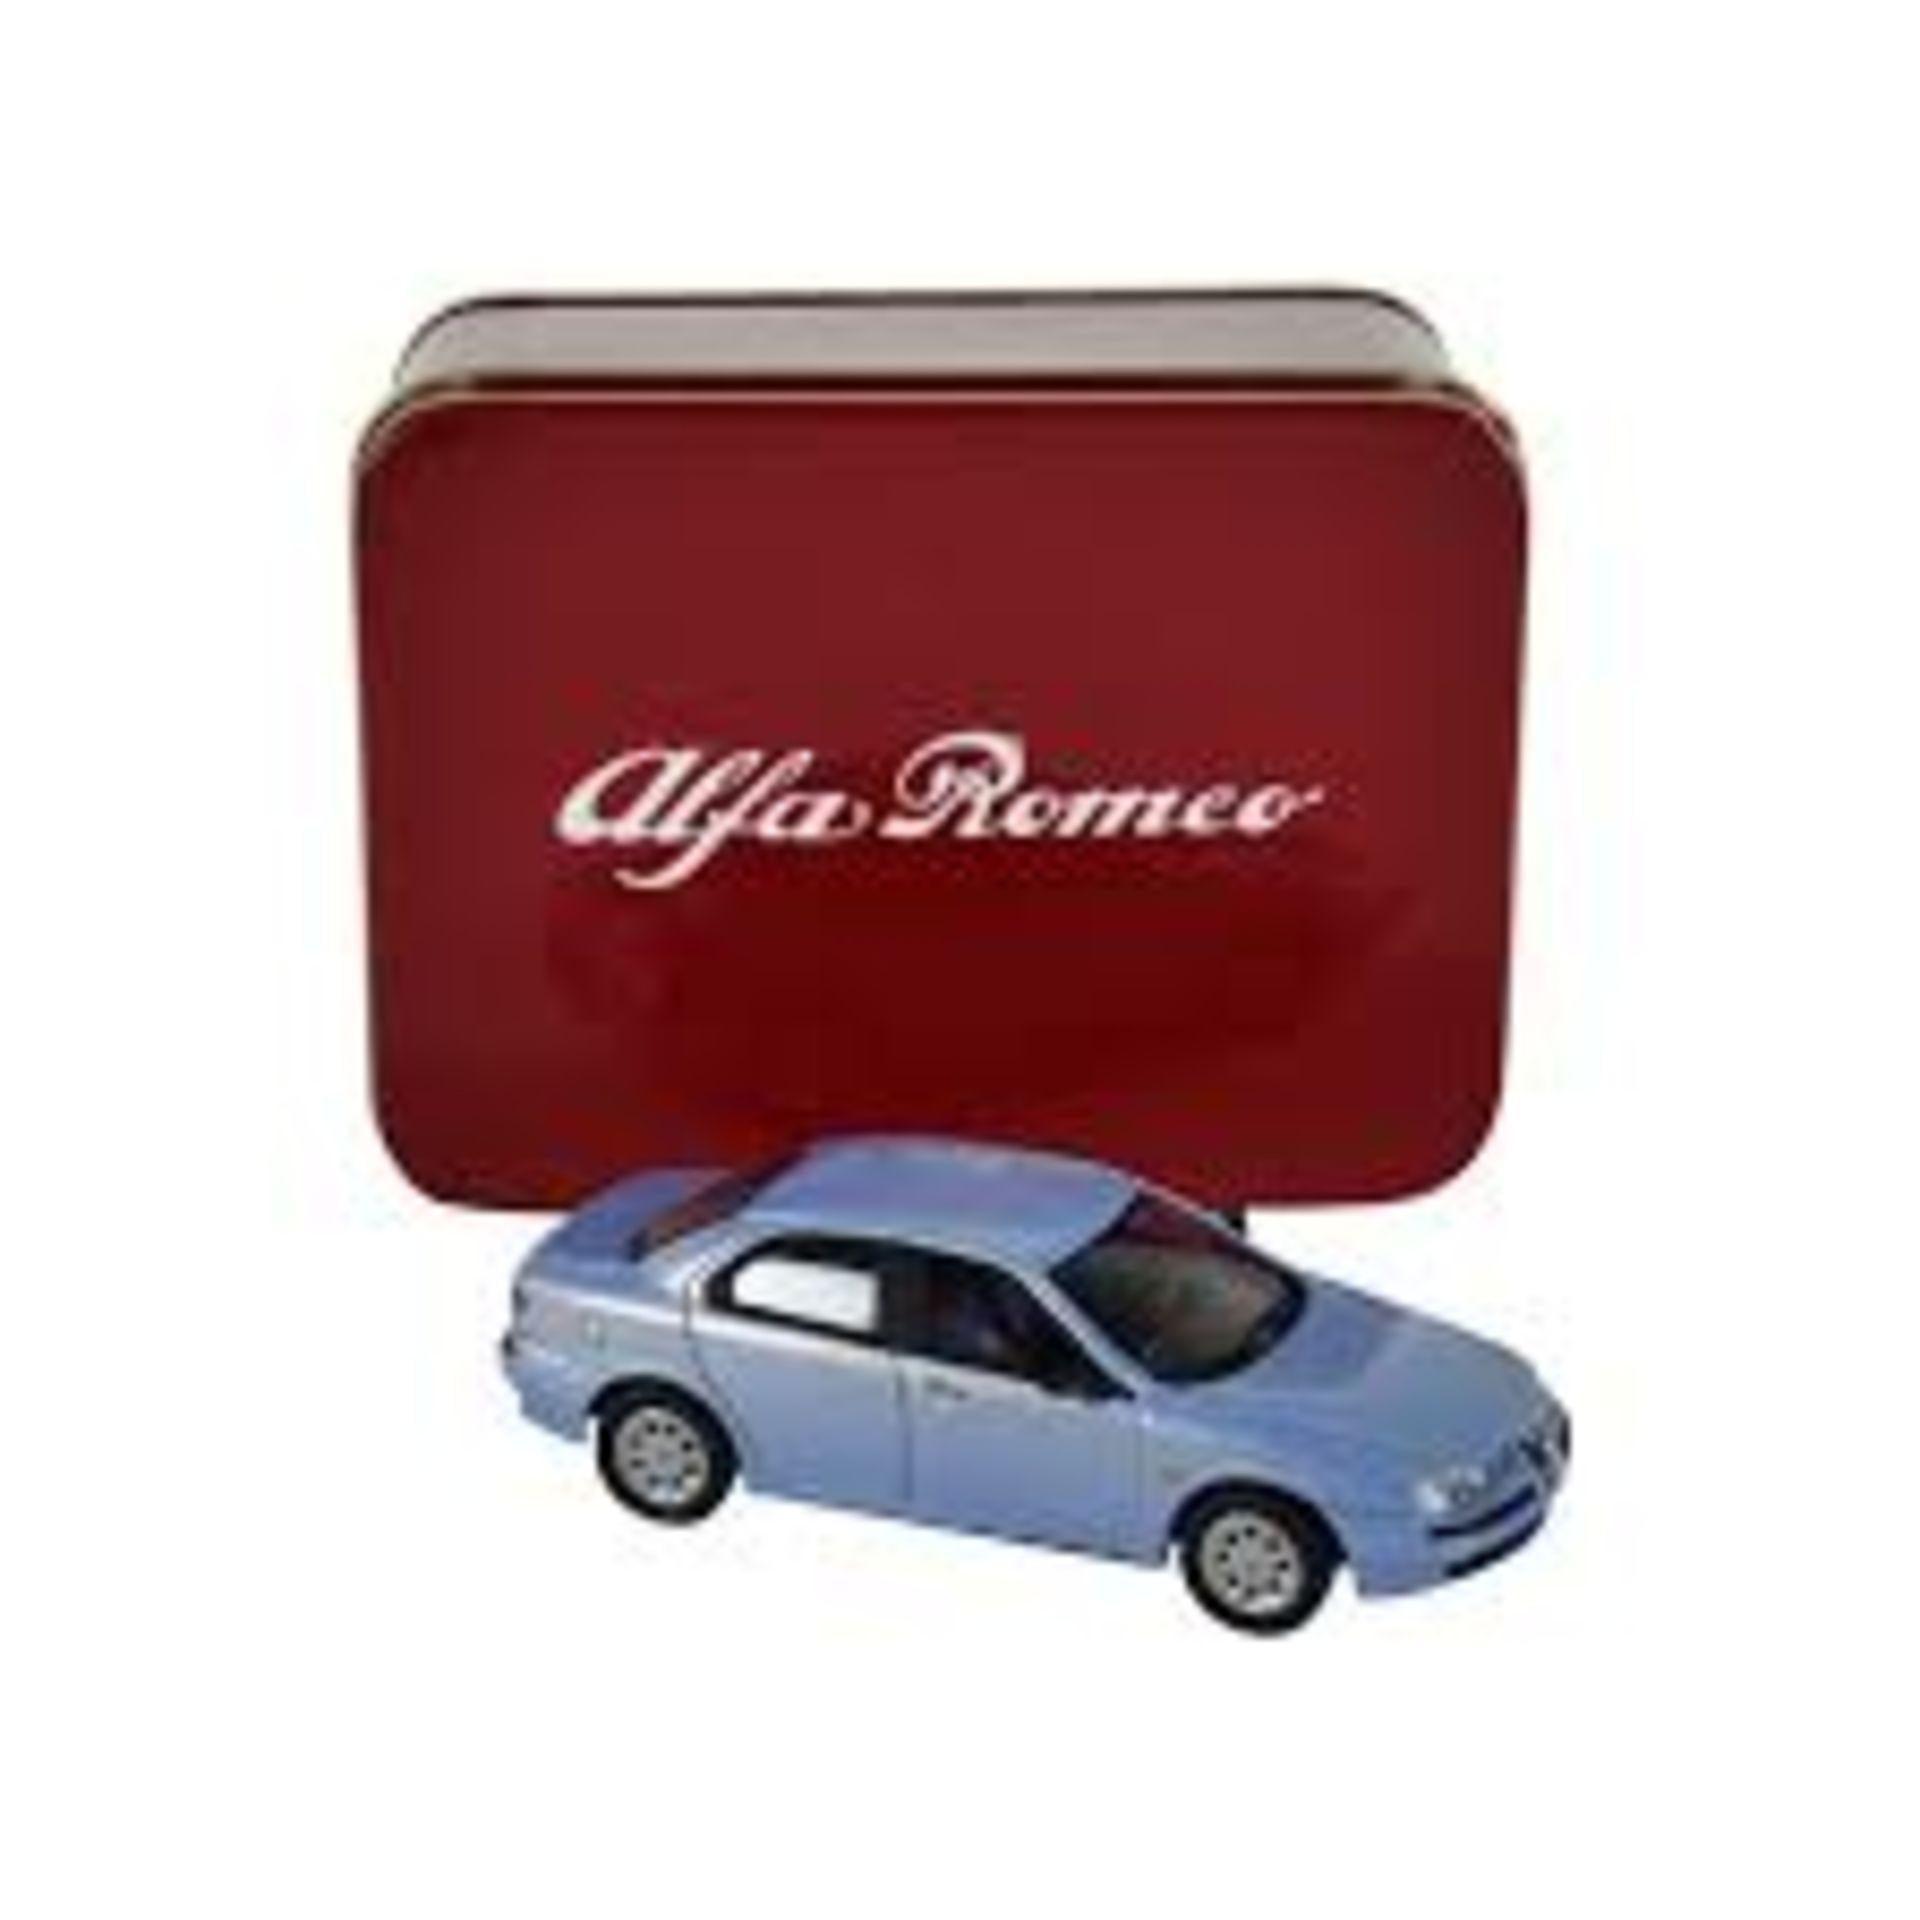 Lot 10035 - V Brand New 1/43 Diecast 1998 Alfa Romeo 156 - eBay Price £16.99